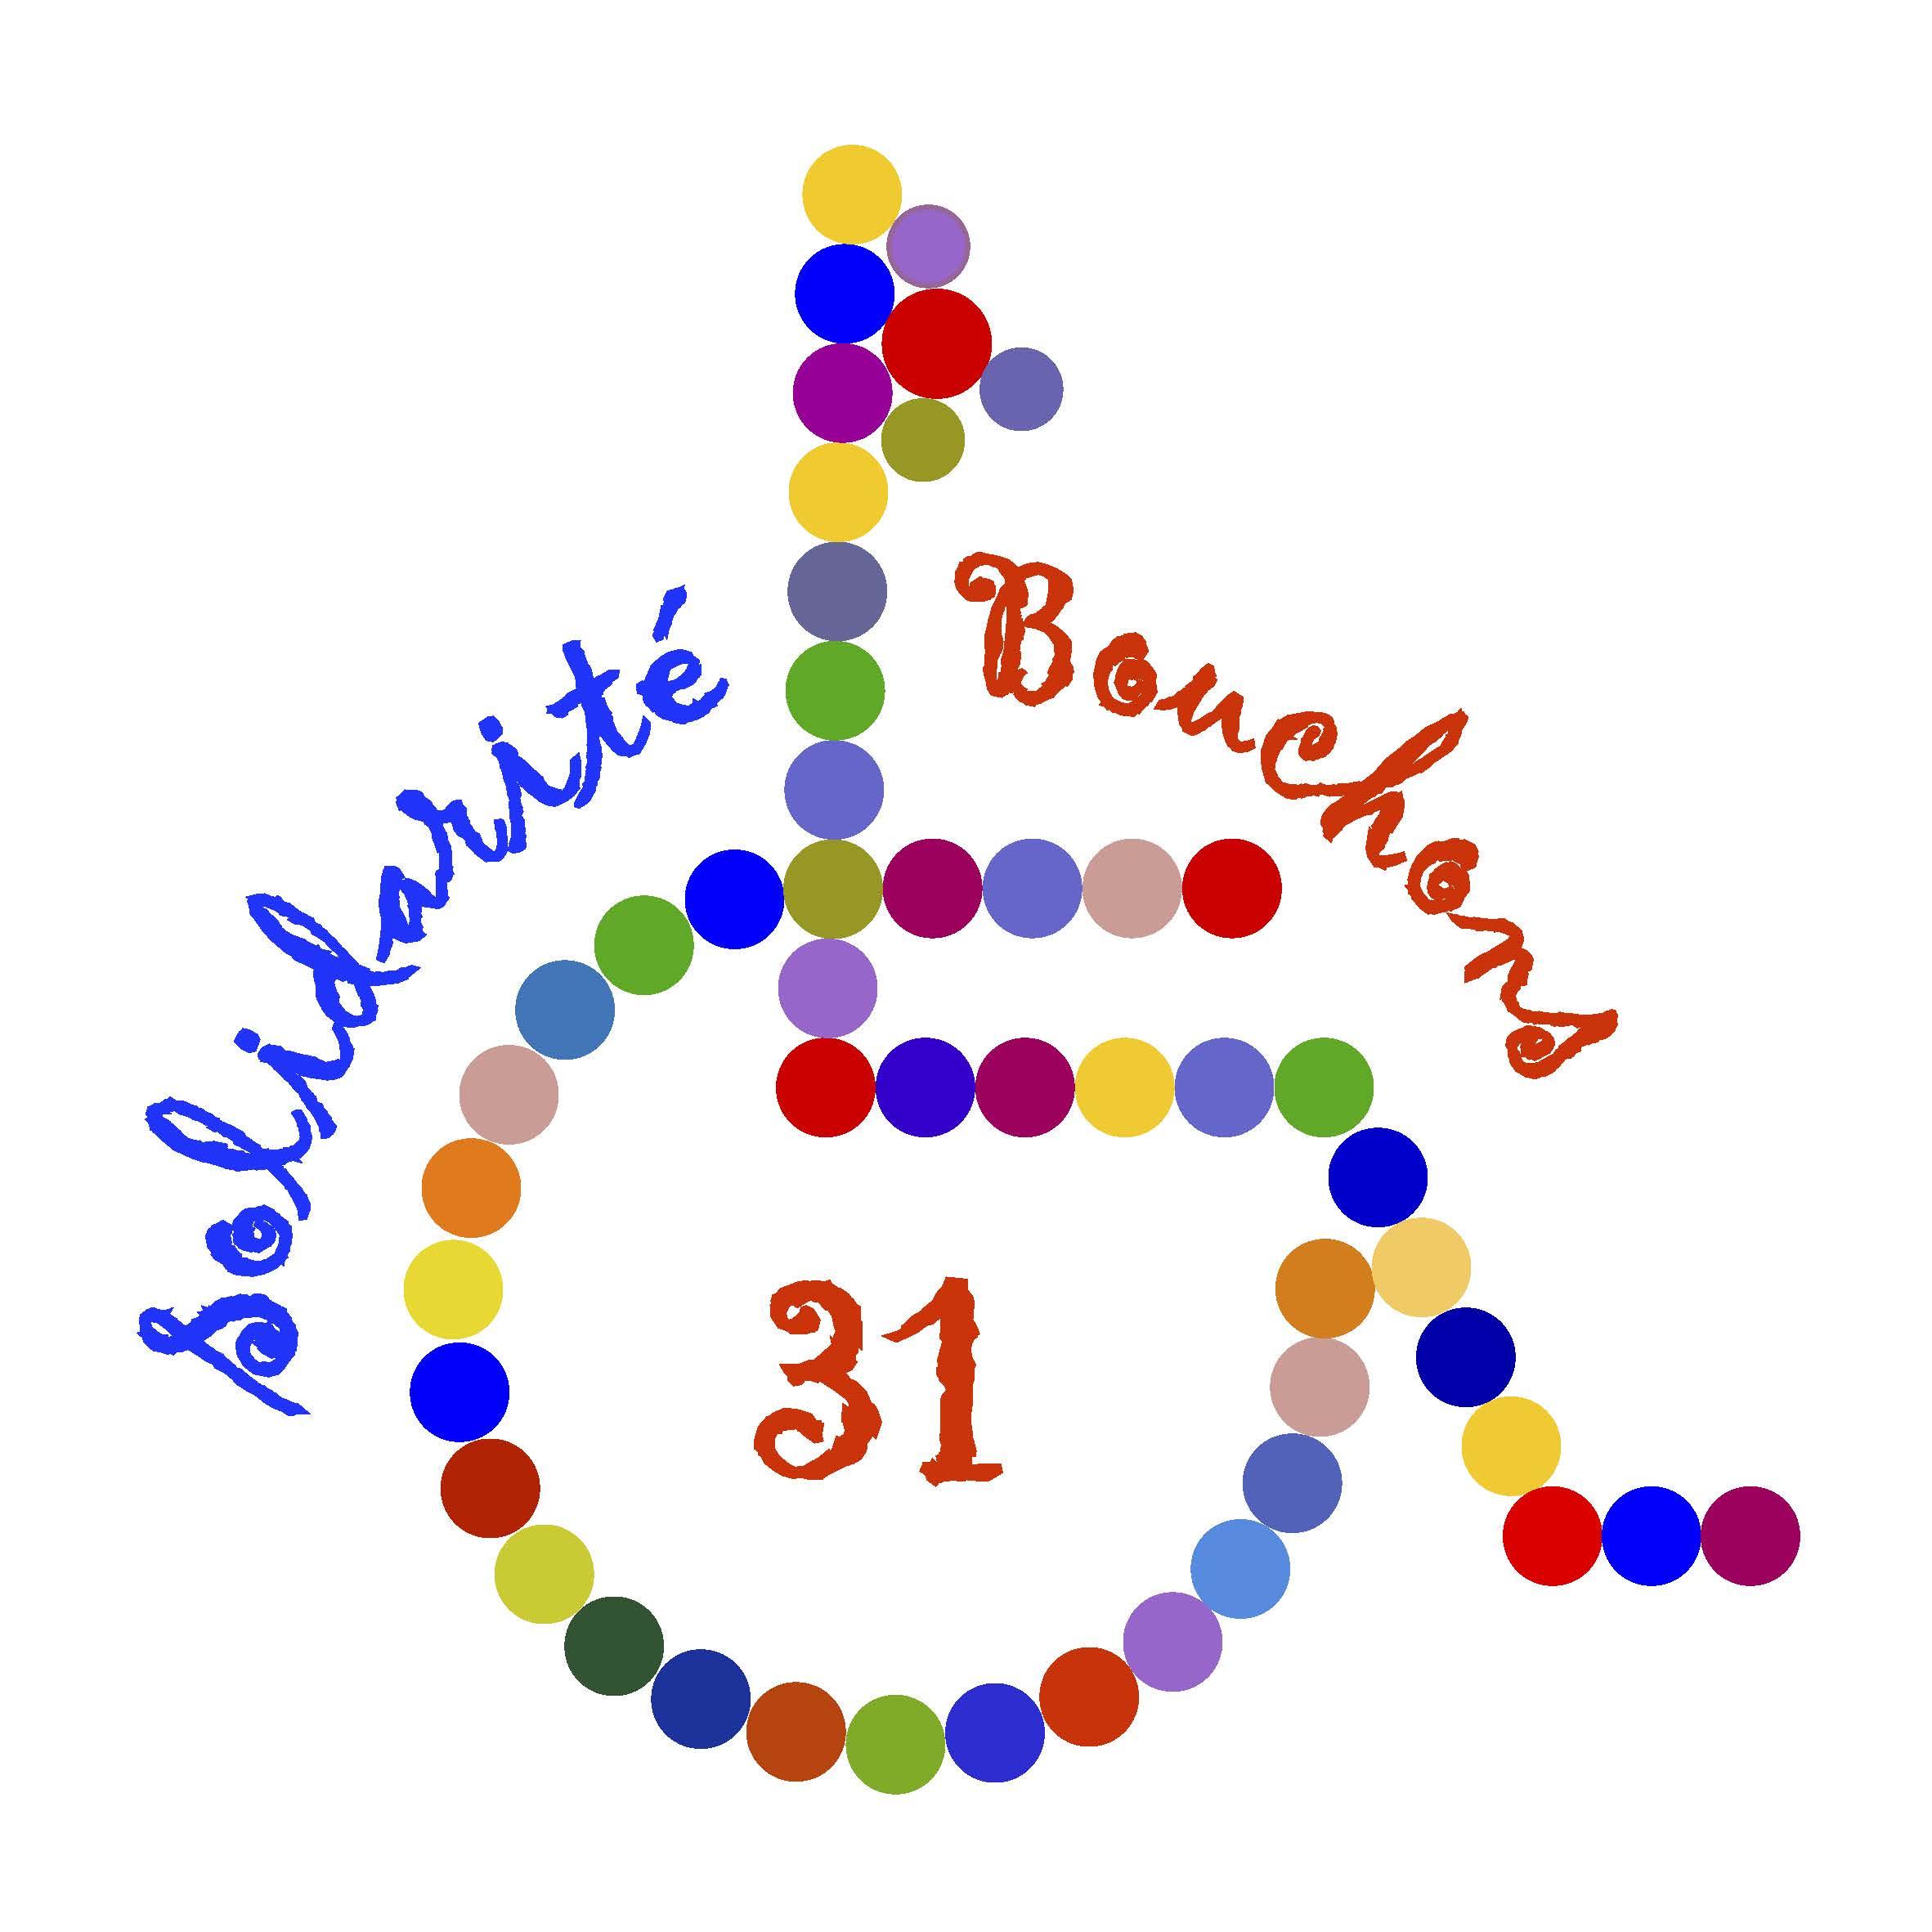 Partenariat avec l'association Solidarité Bouchons 31